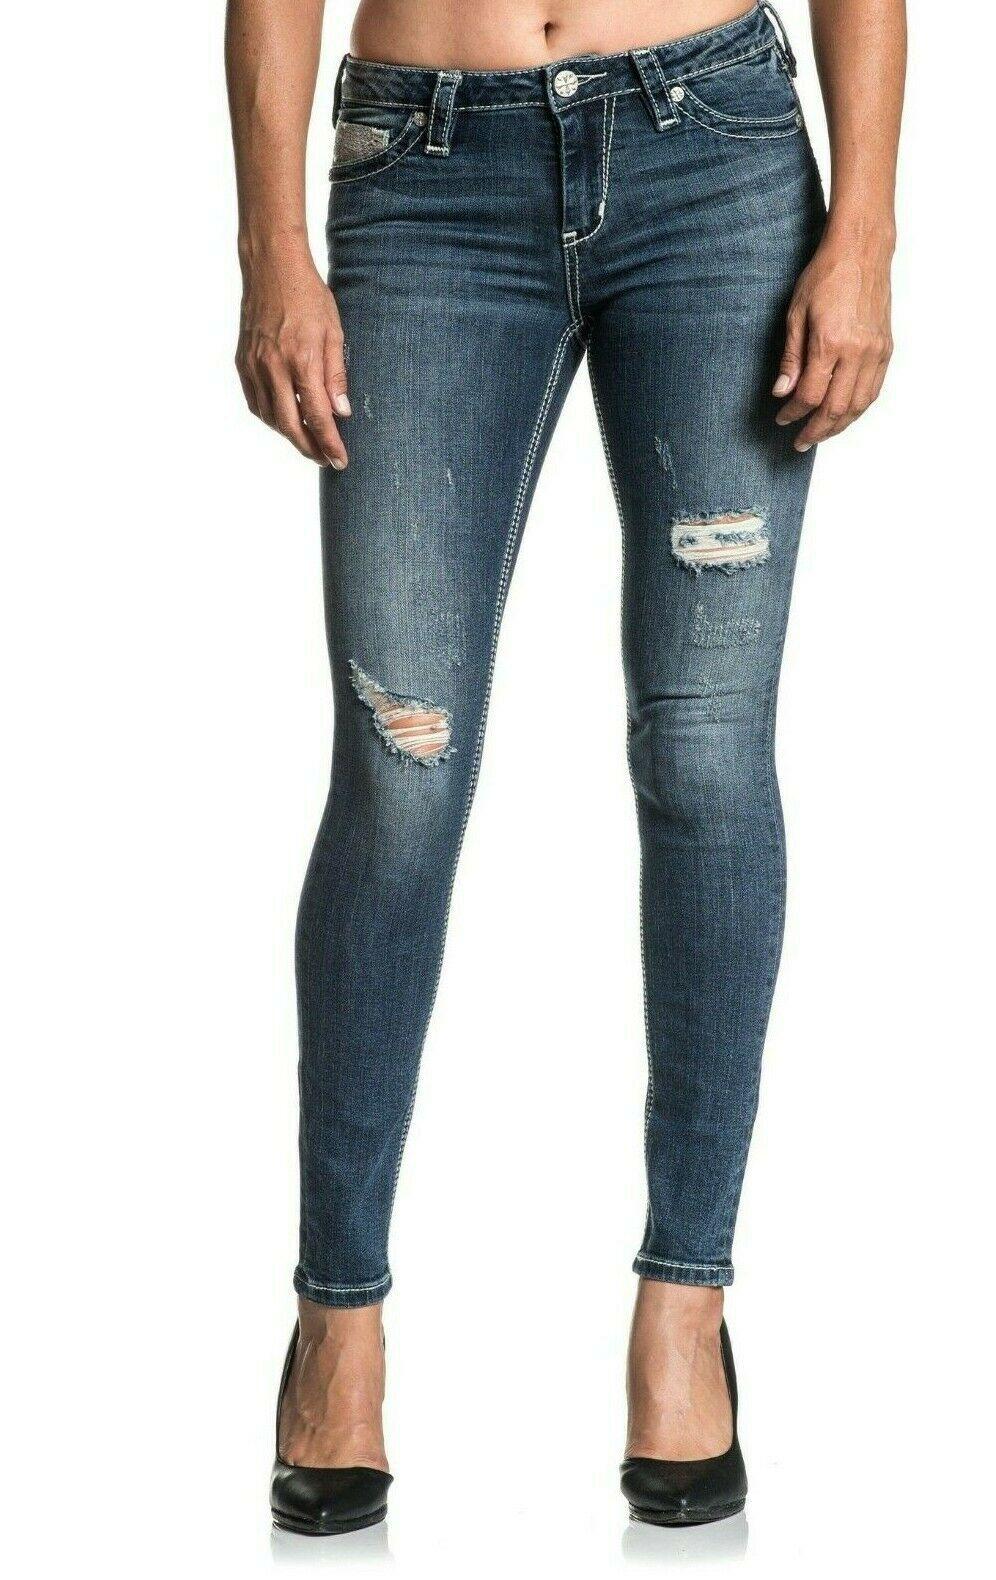 AFFLICTION Women/'s Denim Jeans RAQUEL FLEUR TEAL Embroidered Buckle $125 B38